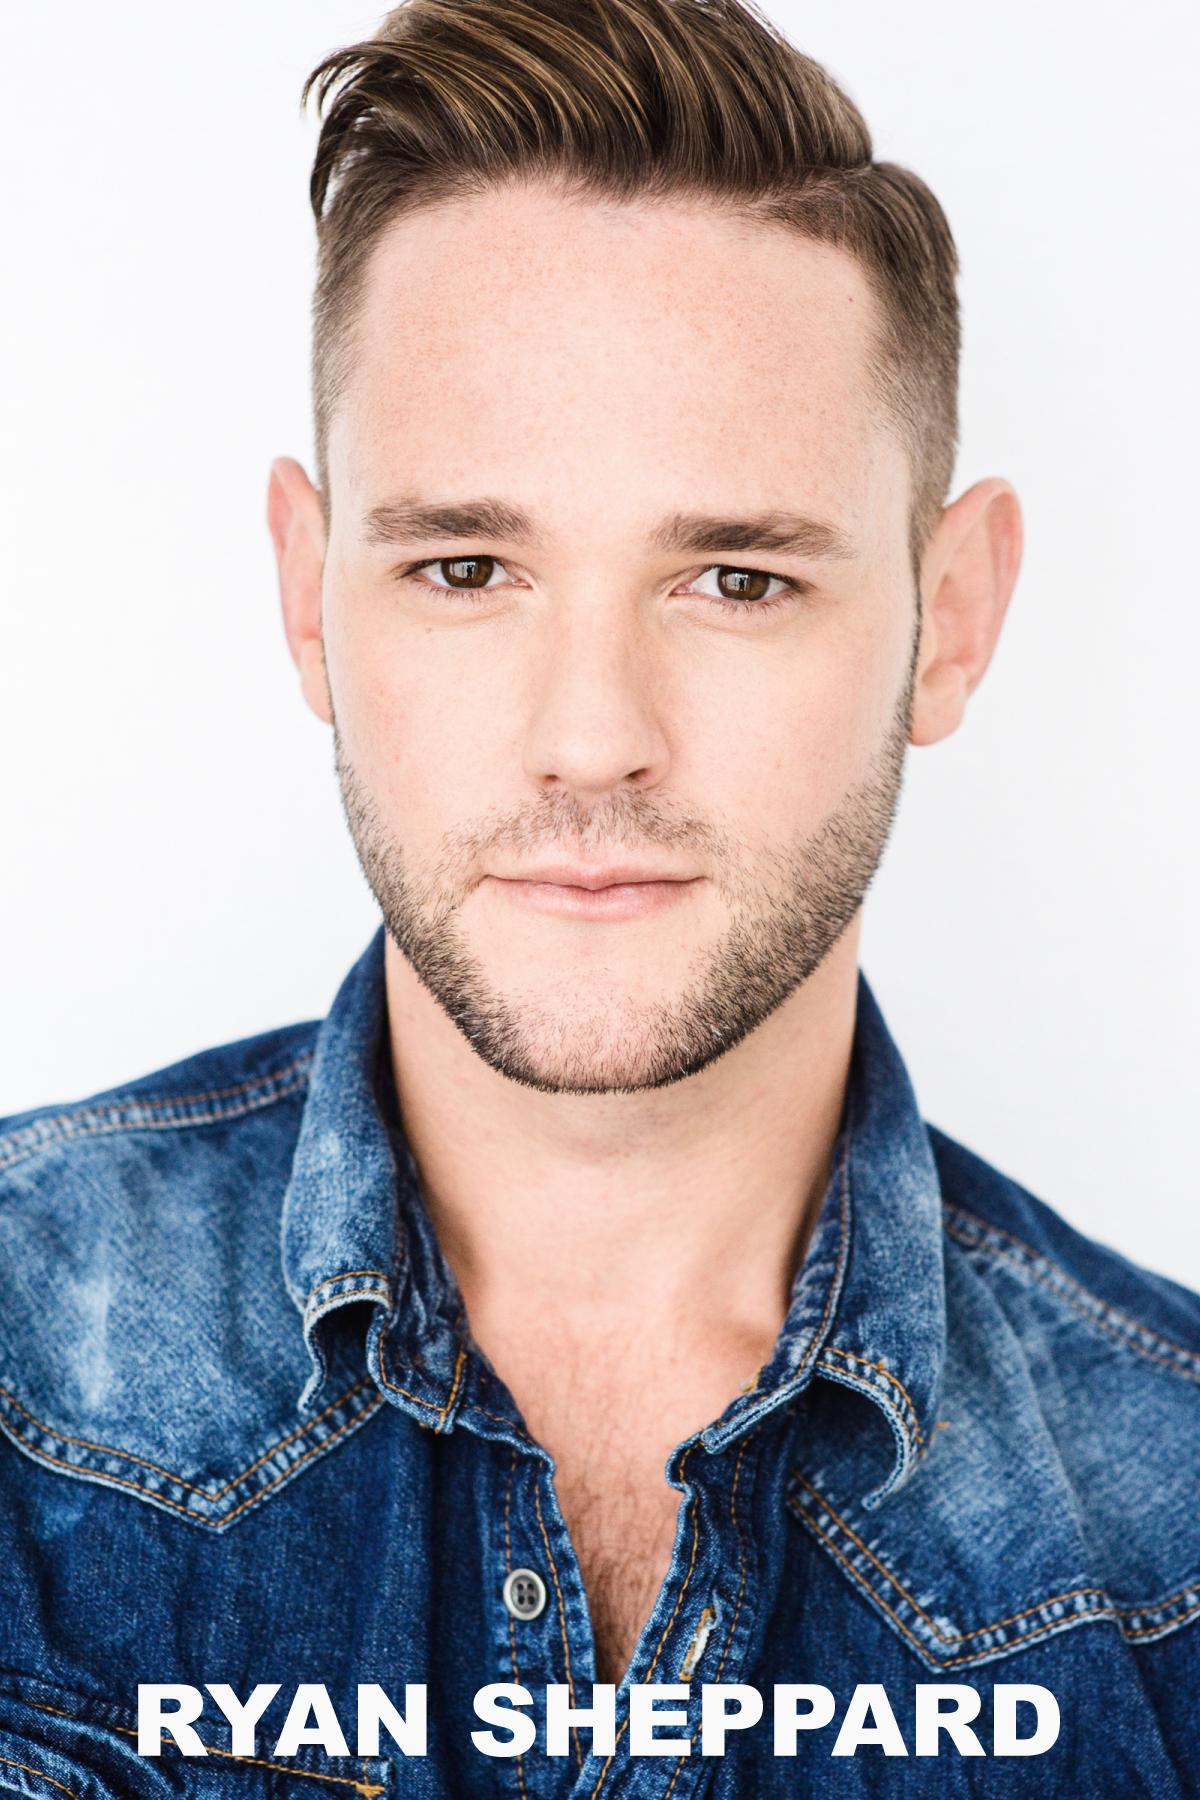 Ryan-Sheppard-(Singer,-Dancer,-Actor).png